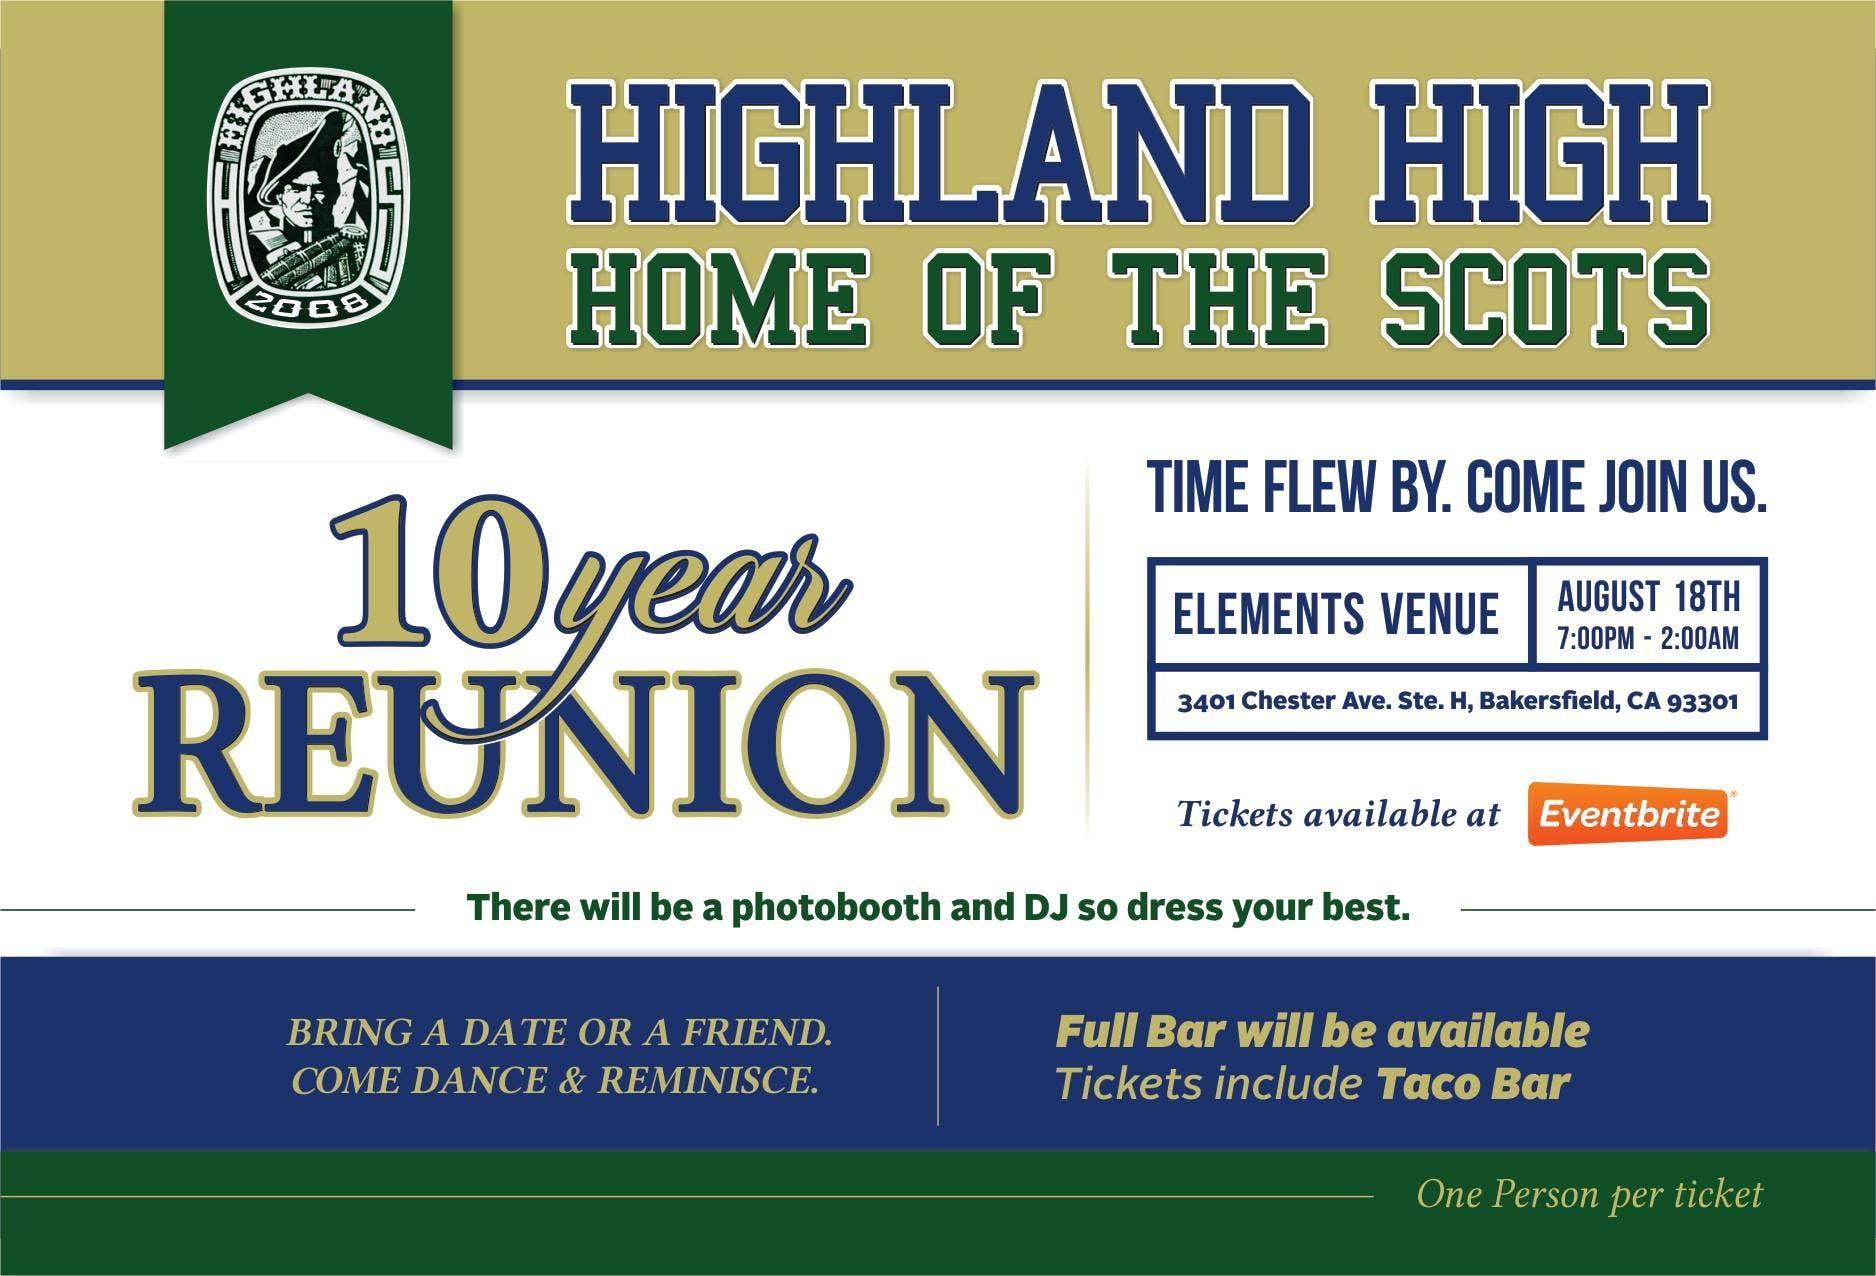 Highland High School 10 Year Reunion 18 Aug 2018